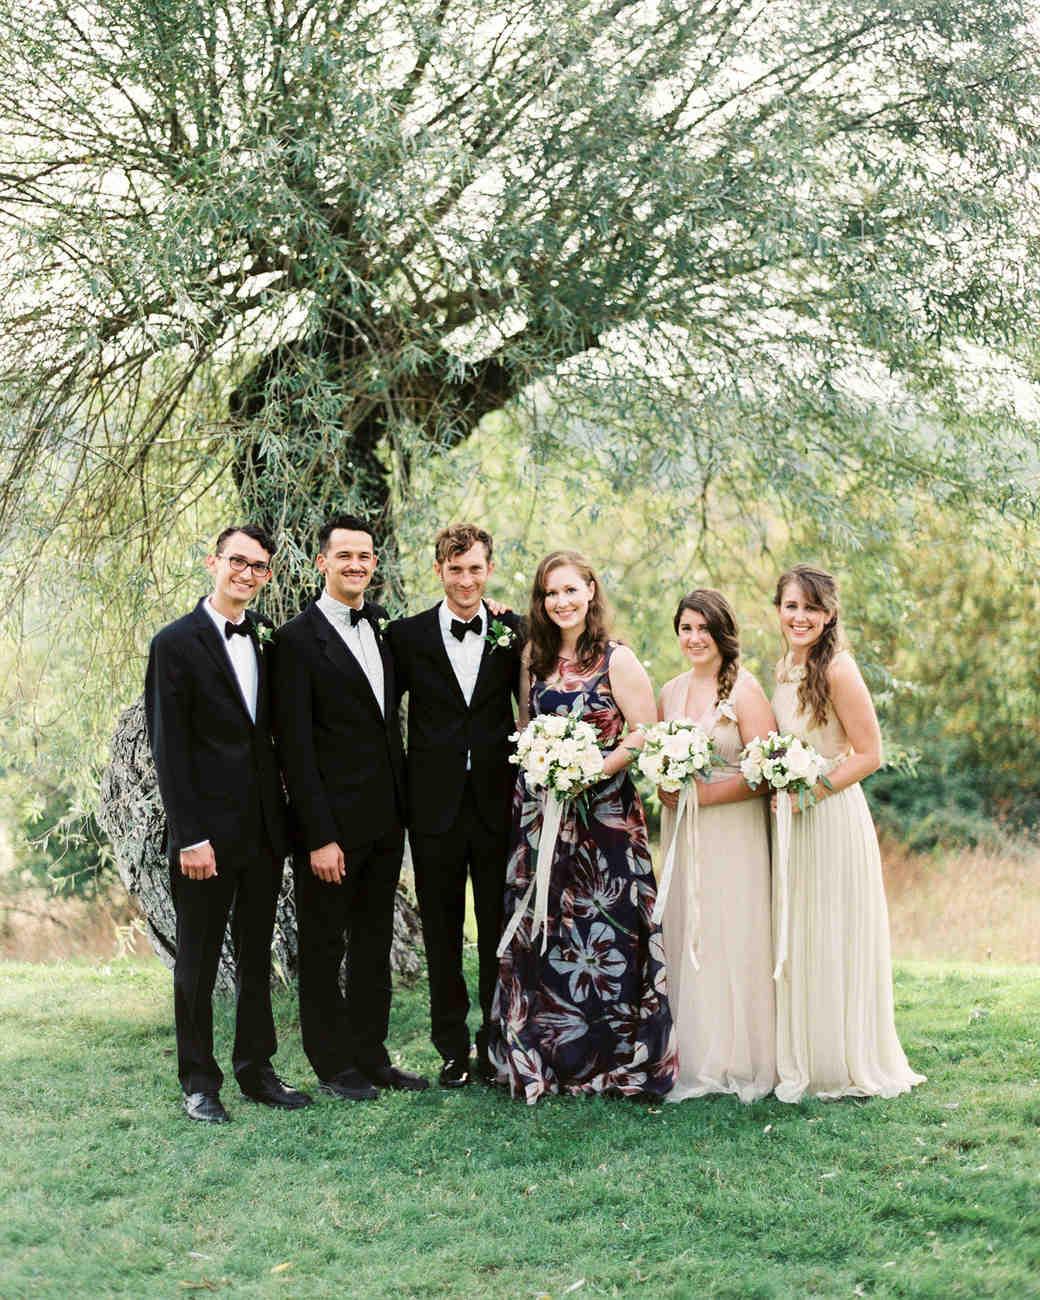 christine-dagan-wedding-bridalparty-4294_04-s113011-0616.jpg